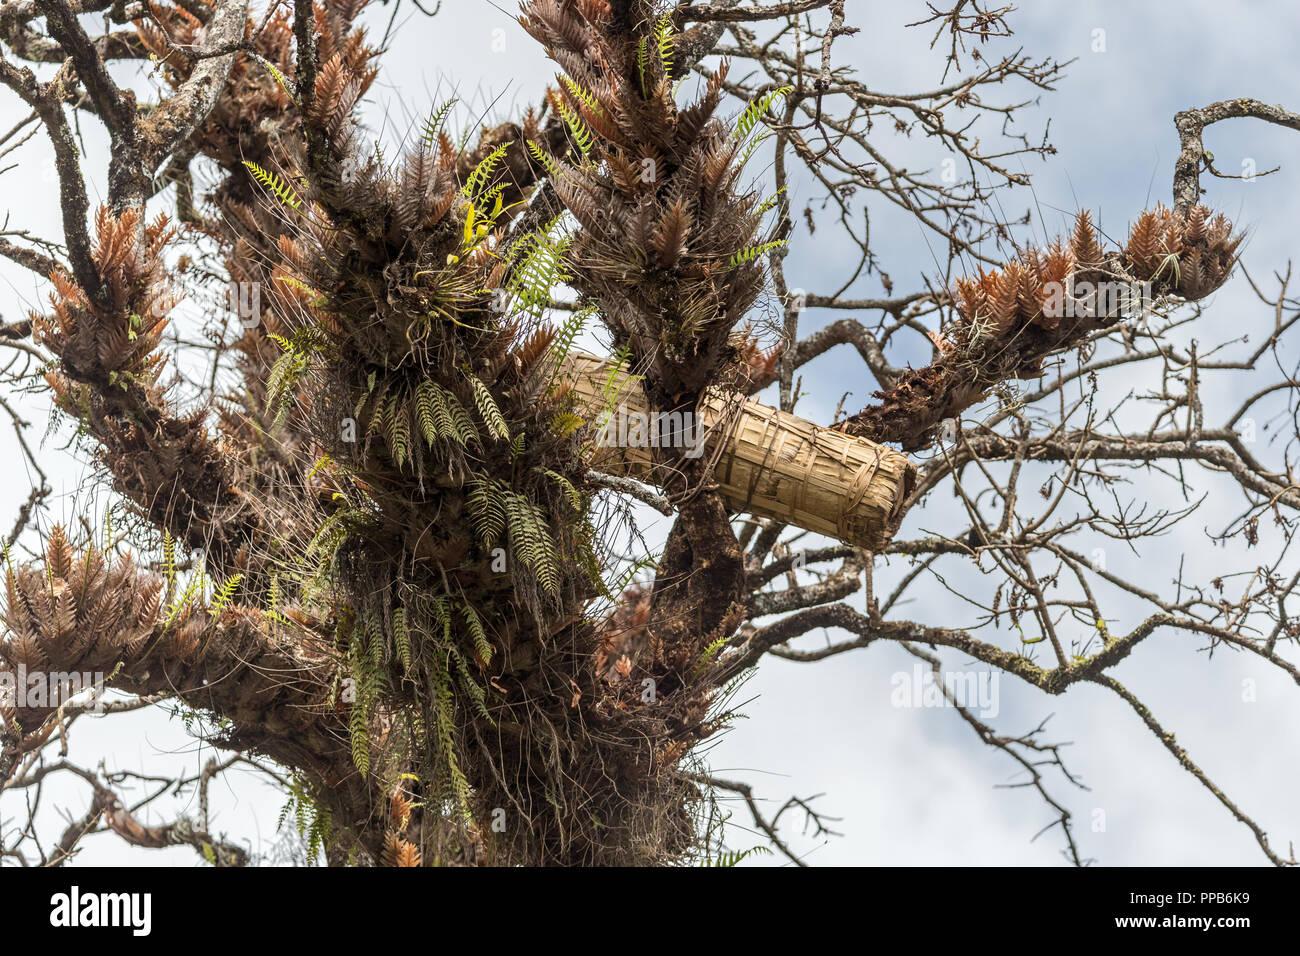 Beehive, Bale Mountains, Ethiopia - Stock Image